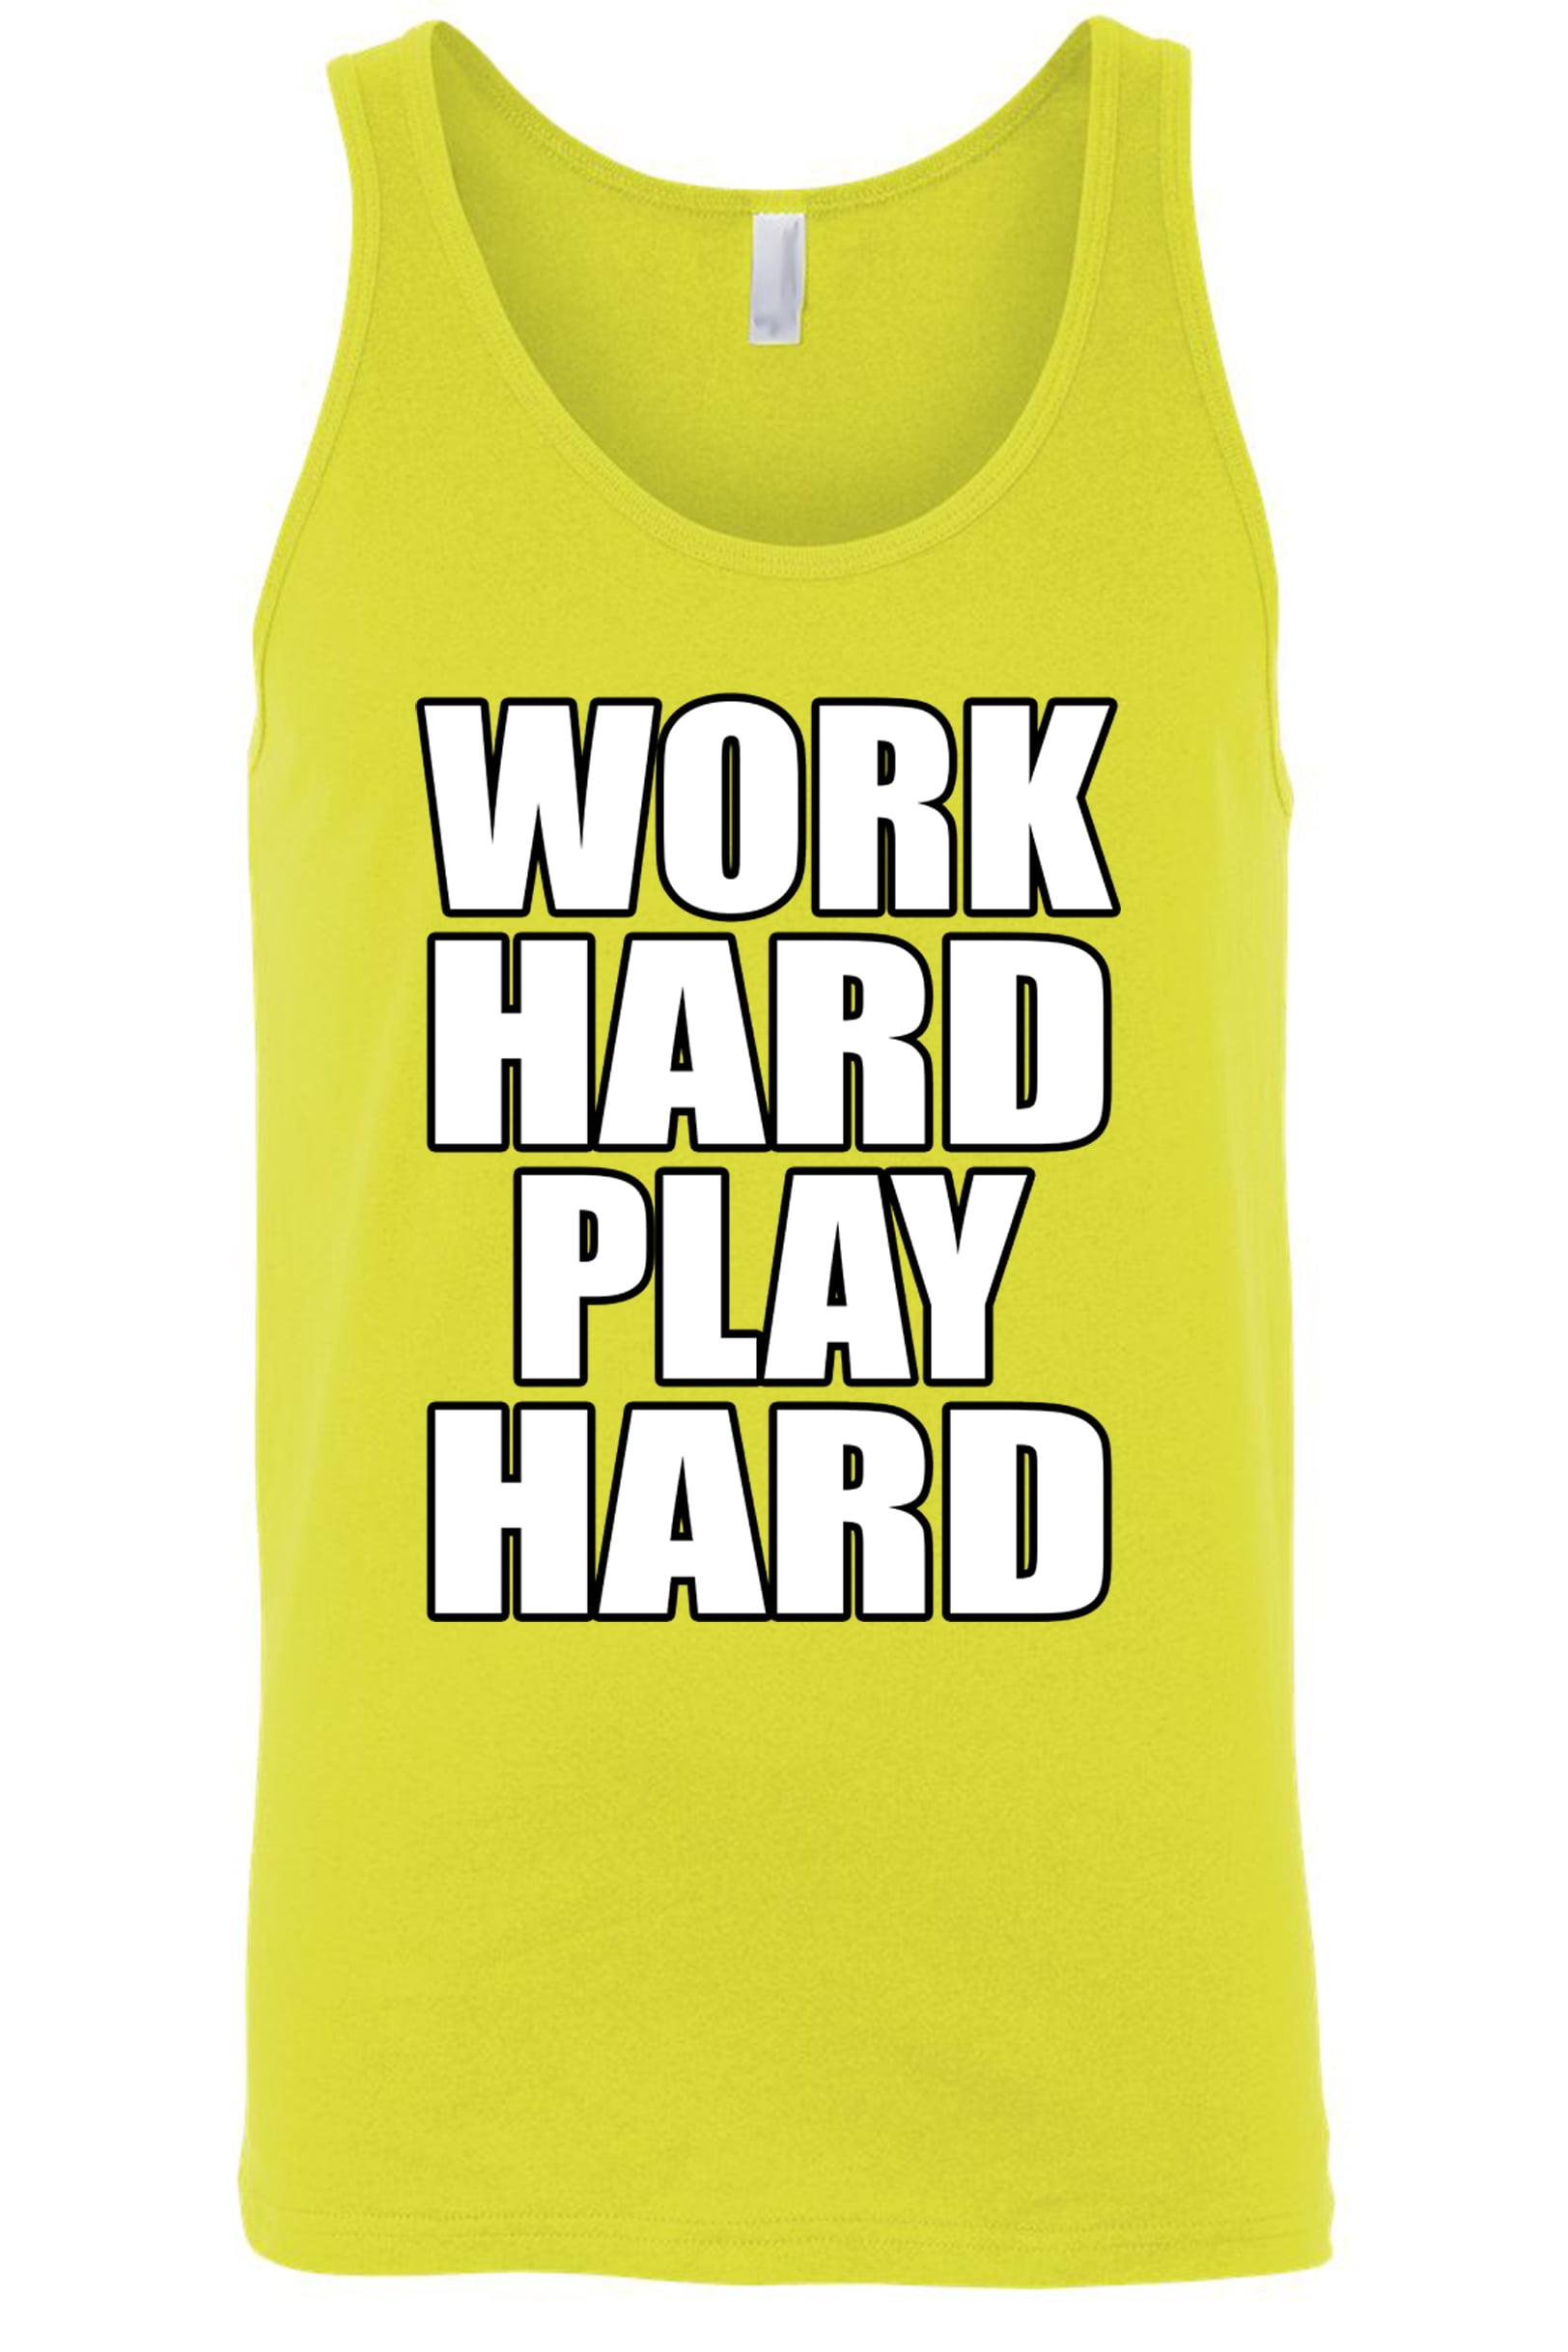 Men's Work Hard Play Hard Tank Top Shirt